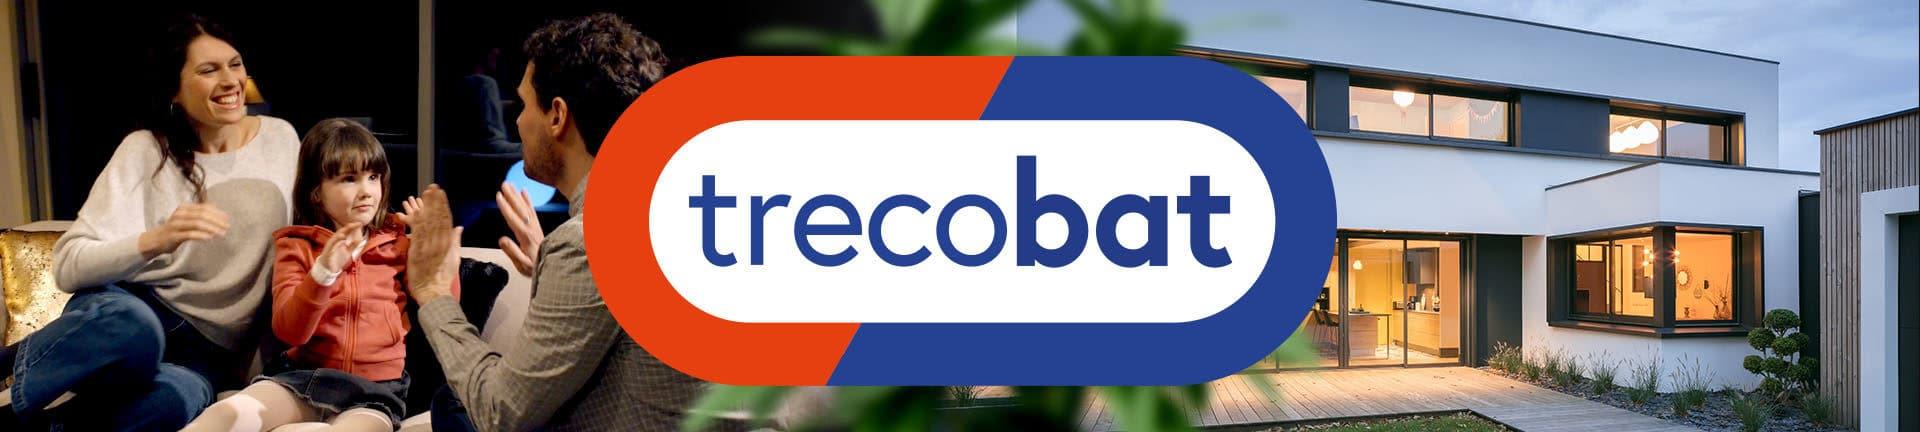 TRECOBAT_HEADER